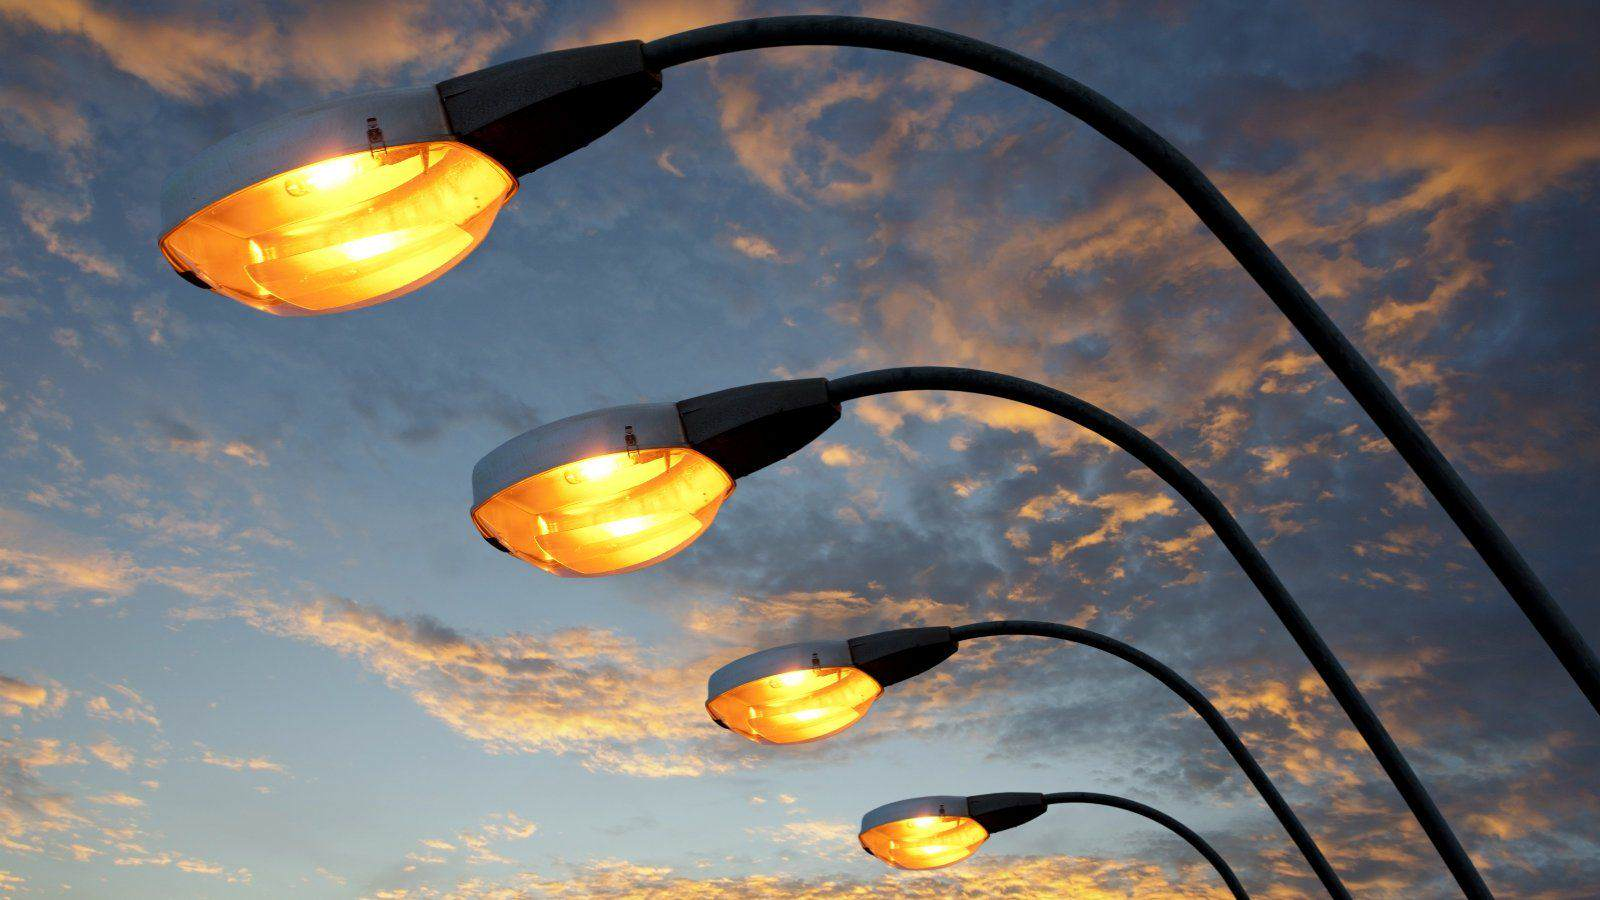 [:ua]кошторис на зовнішнє освітлення вулиць[:ru]смета на наружное освещение улиц[:]